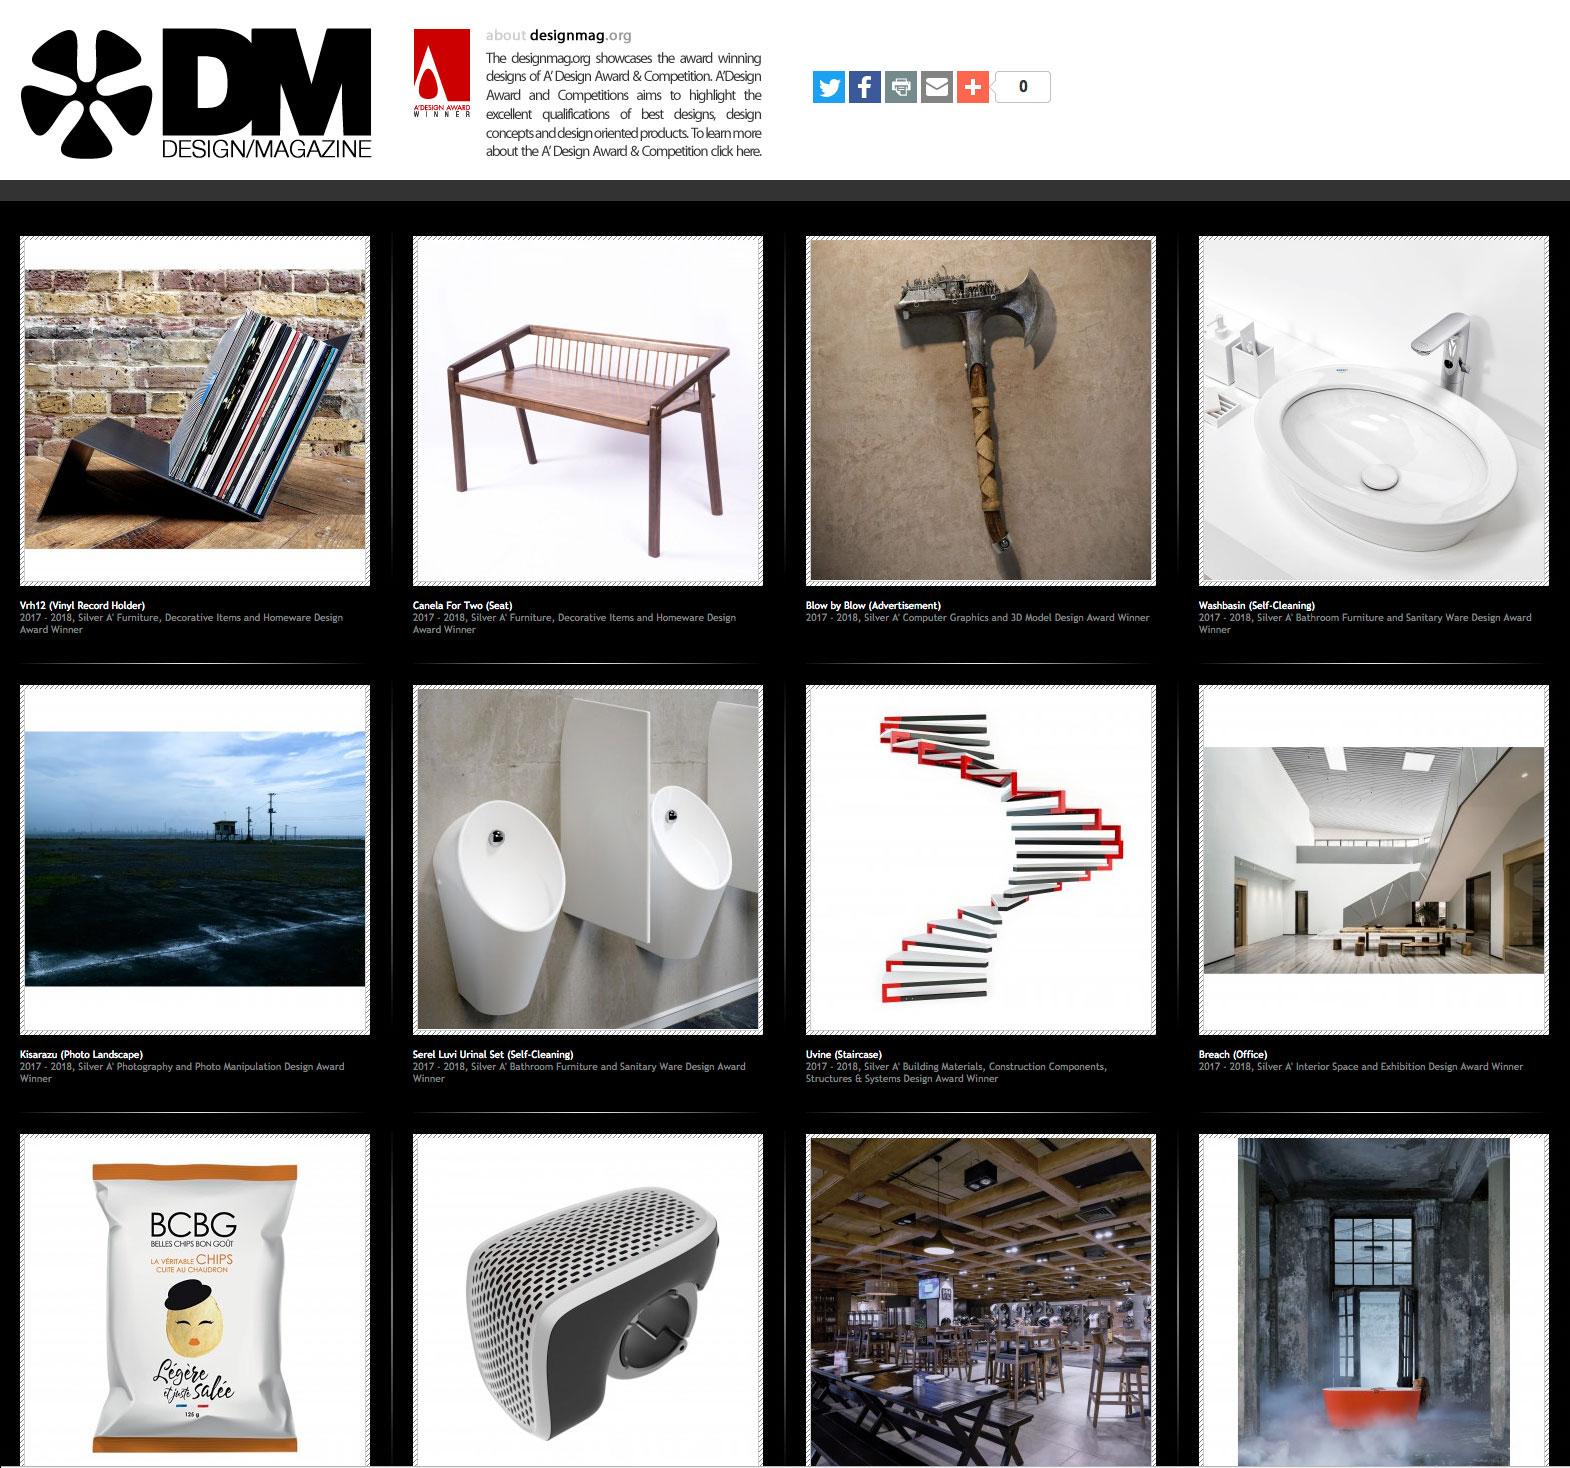 Design_Mag_01.jpg